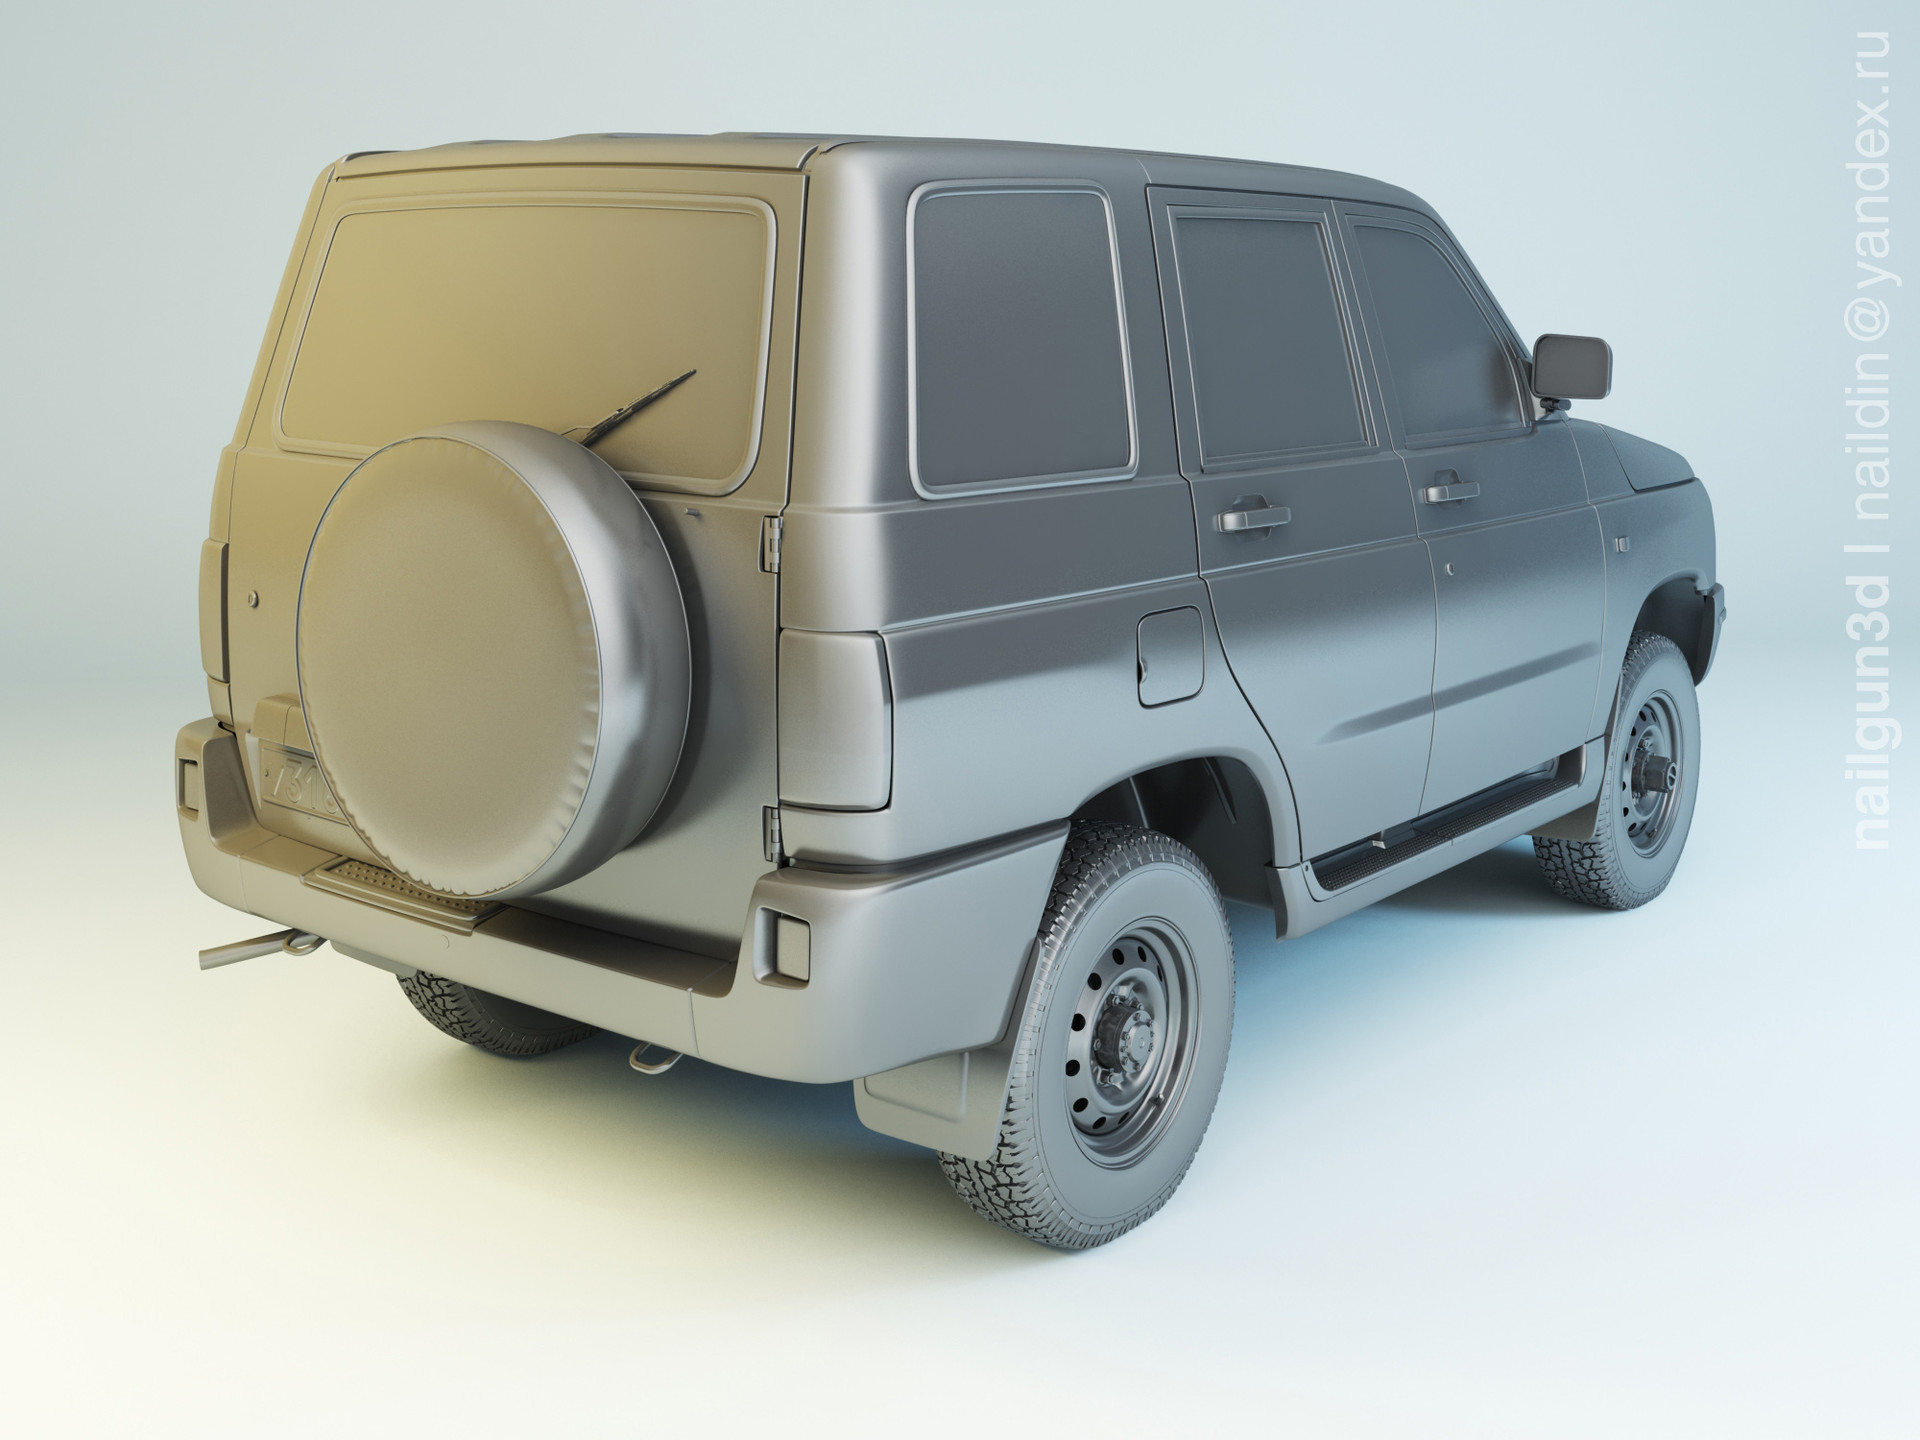 Nail khusnutdinov als 228 000 uaz 3160 simbir modelling 1